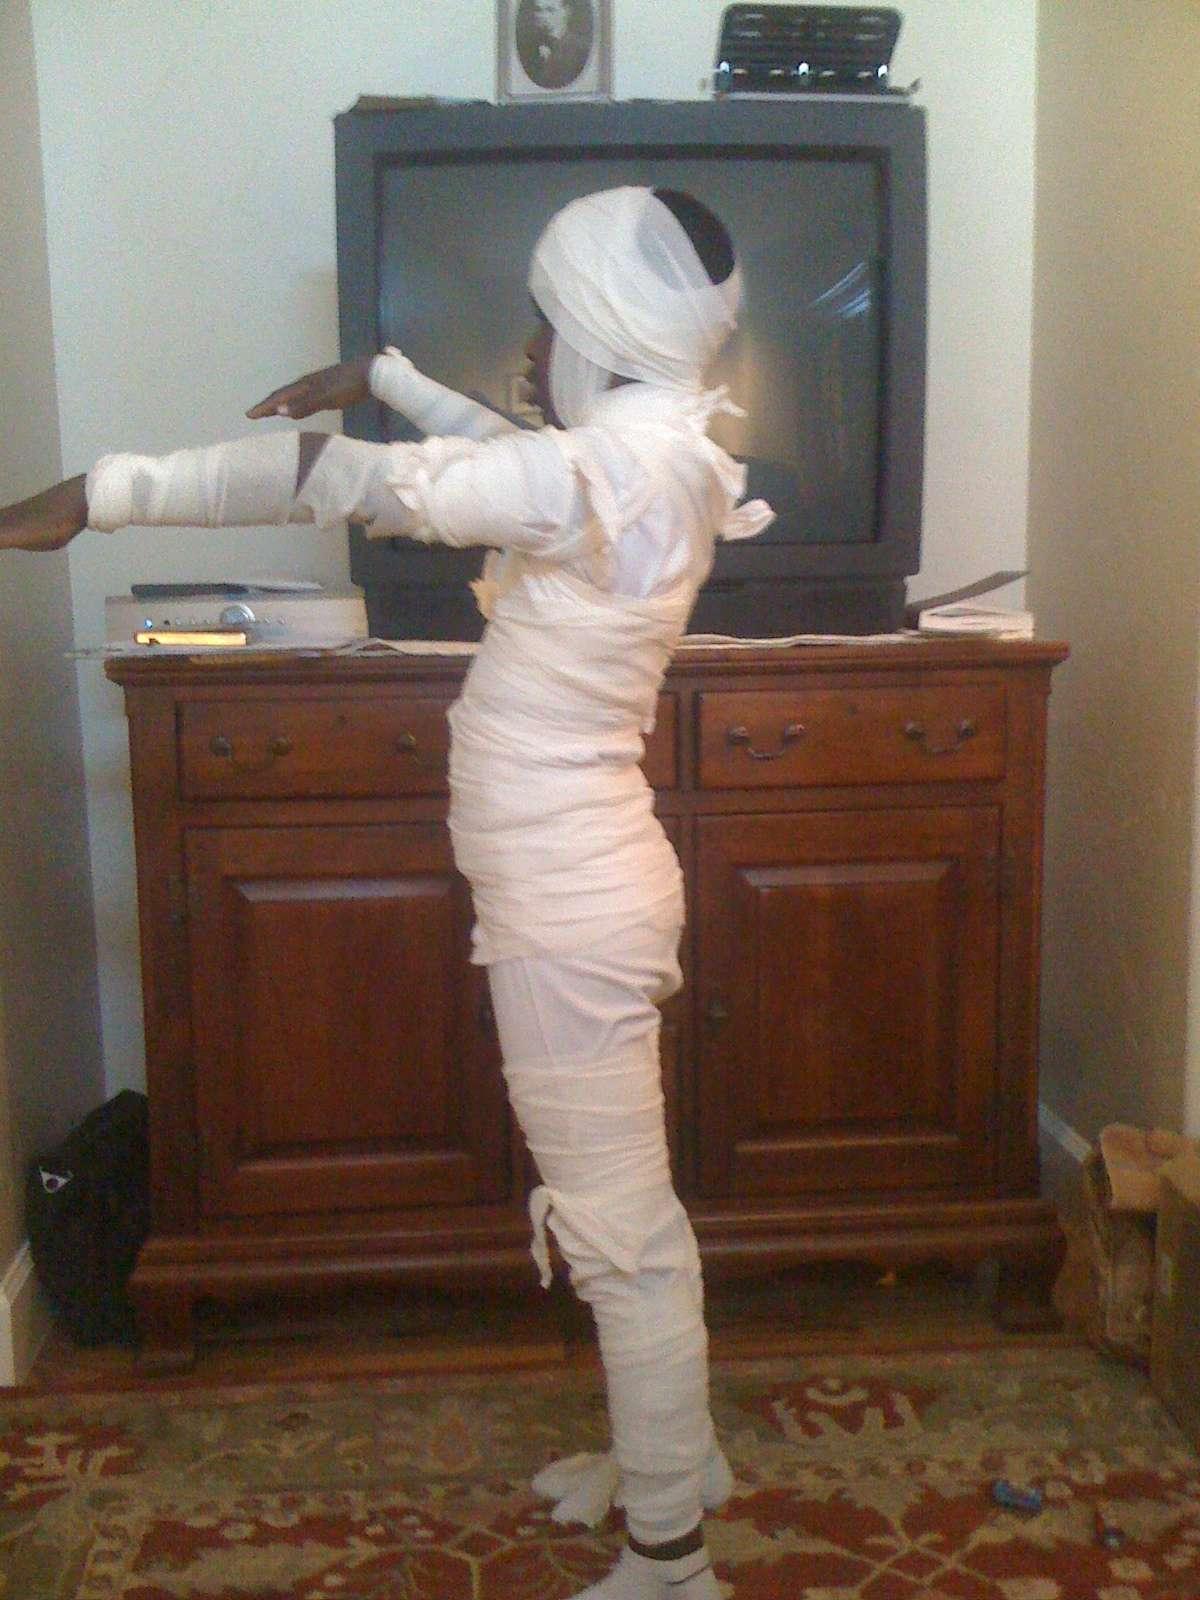 Mummia con garze